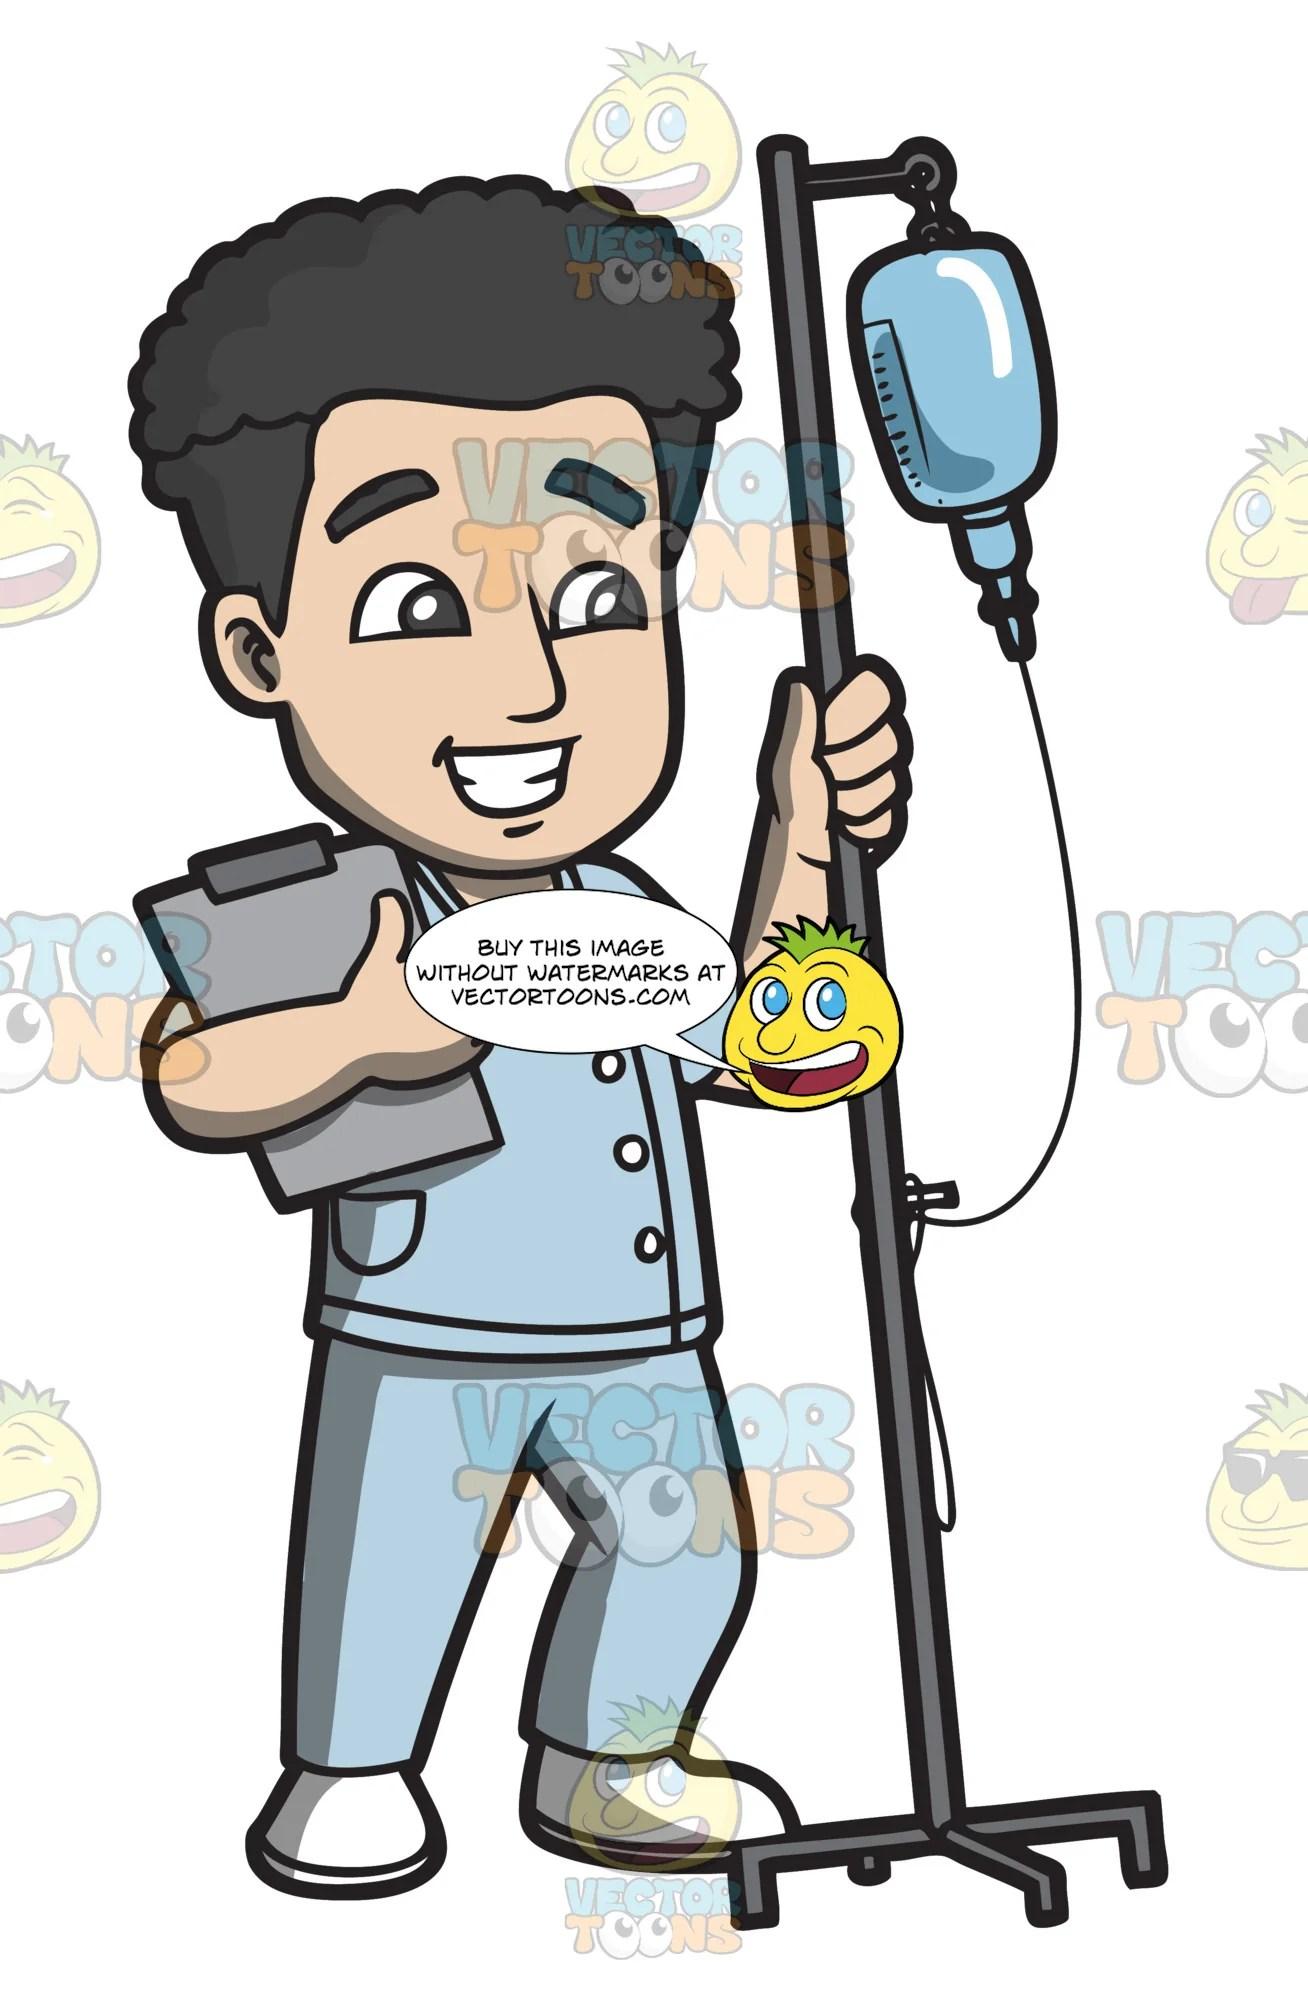 a male nurse carrying an intravenous fluid to a patient clipart cartoons by vectortoons [ 1308 x 2000 Pixel ]